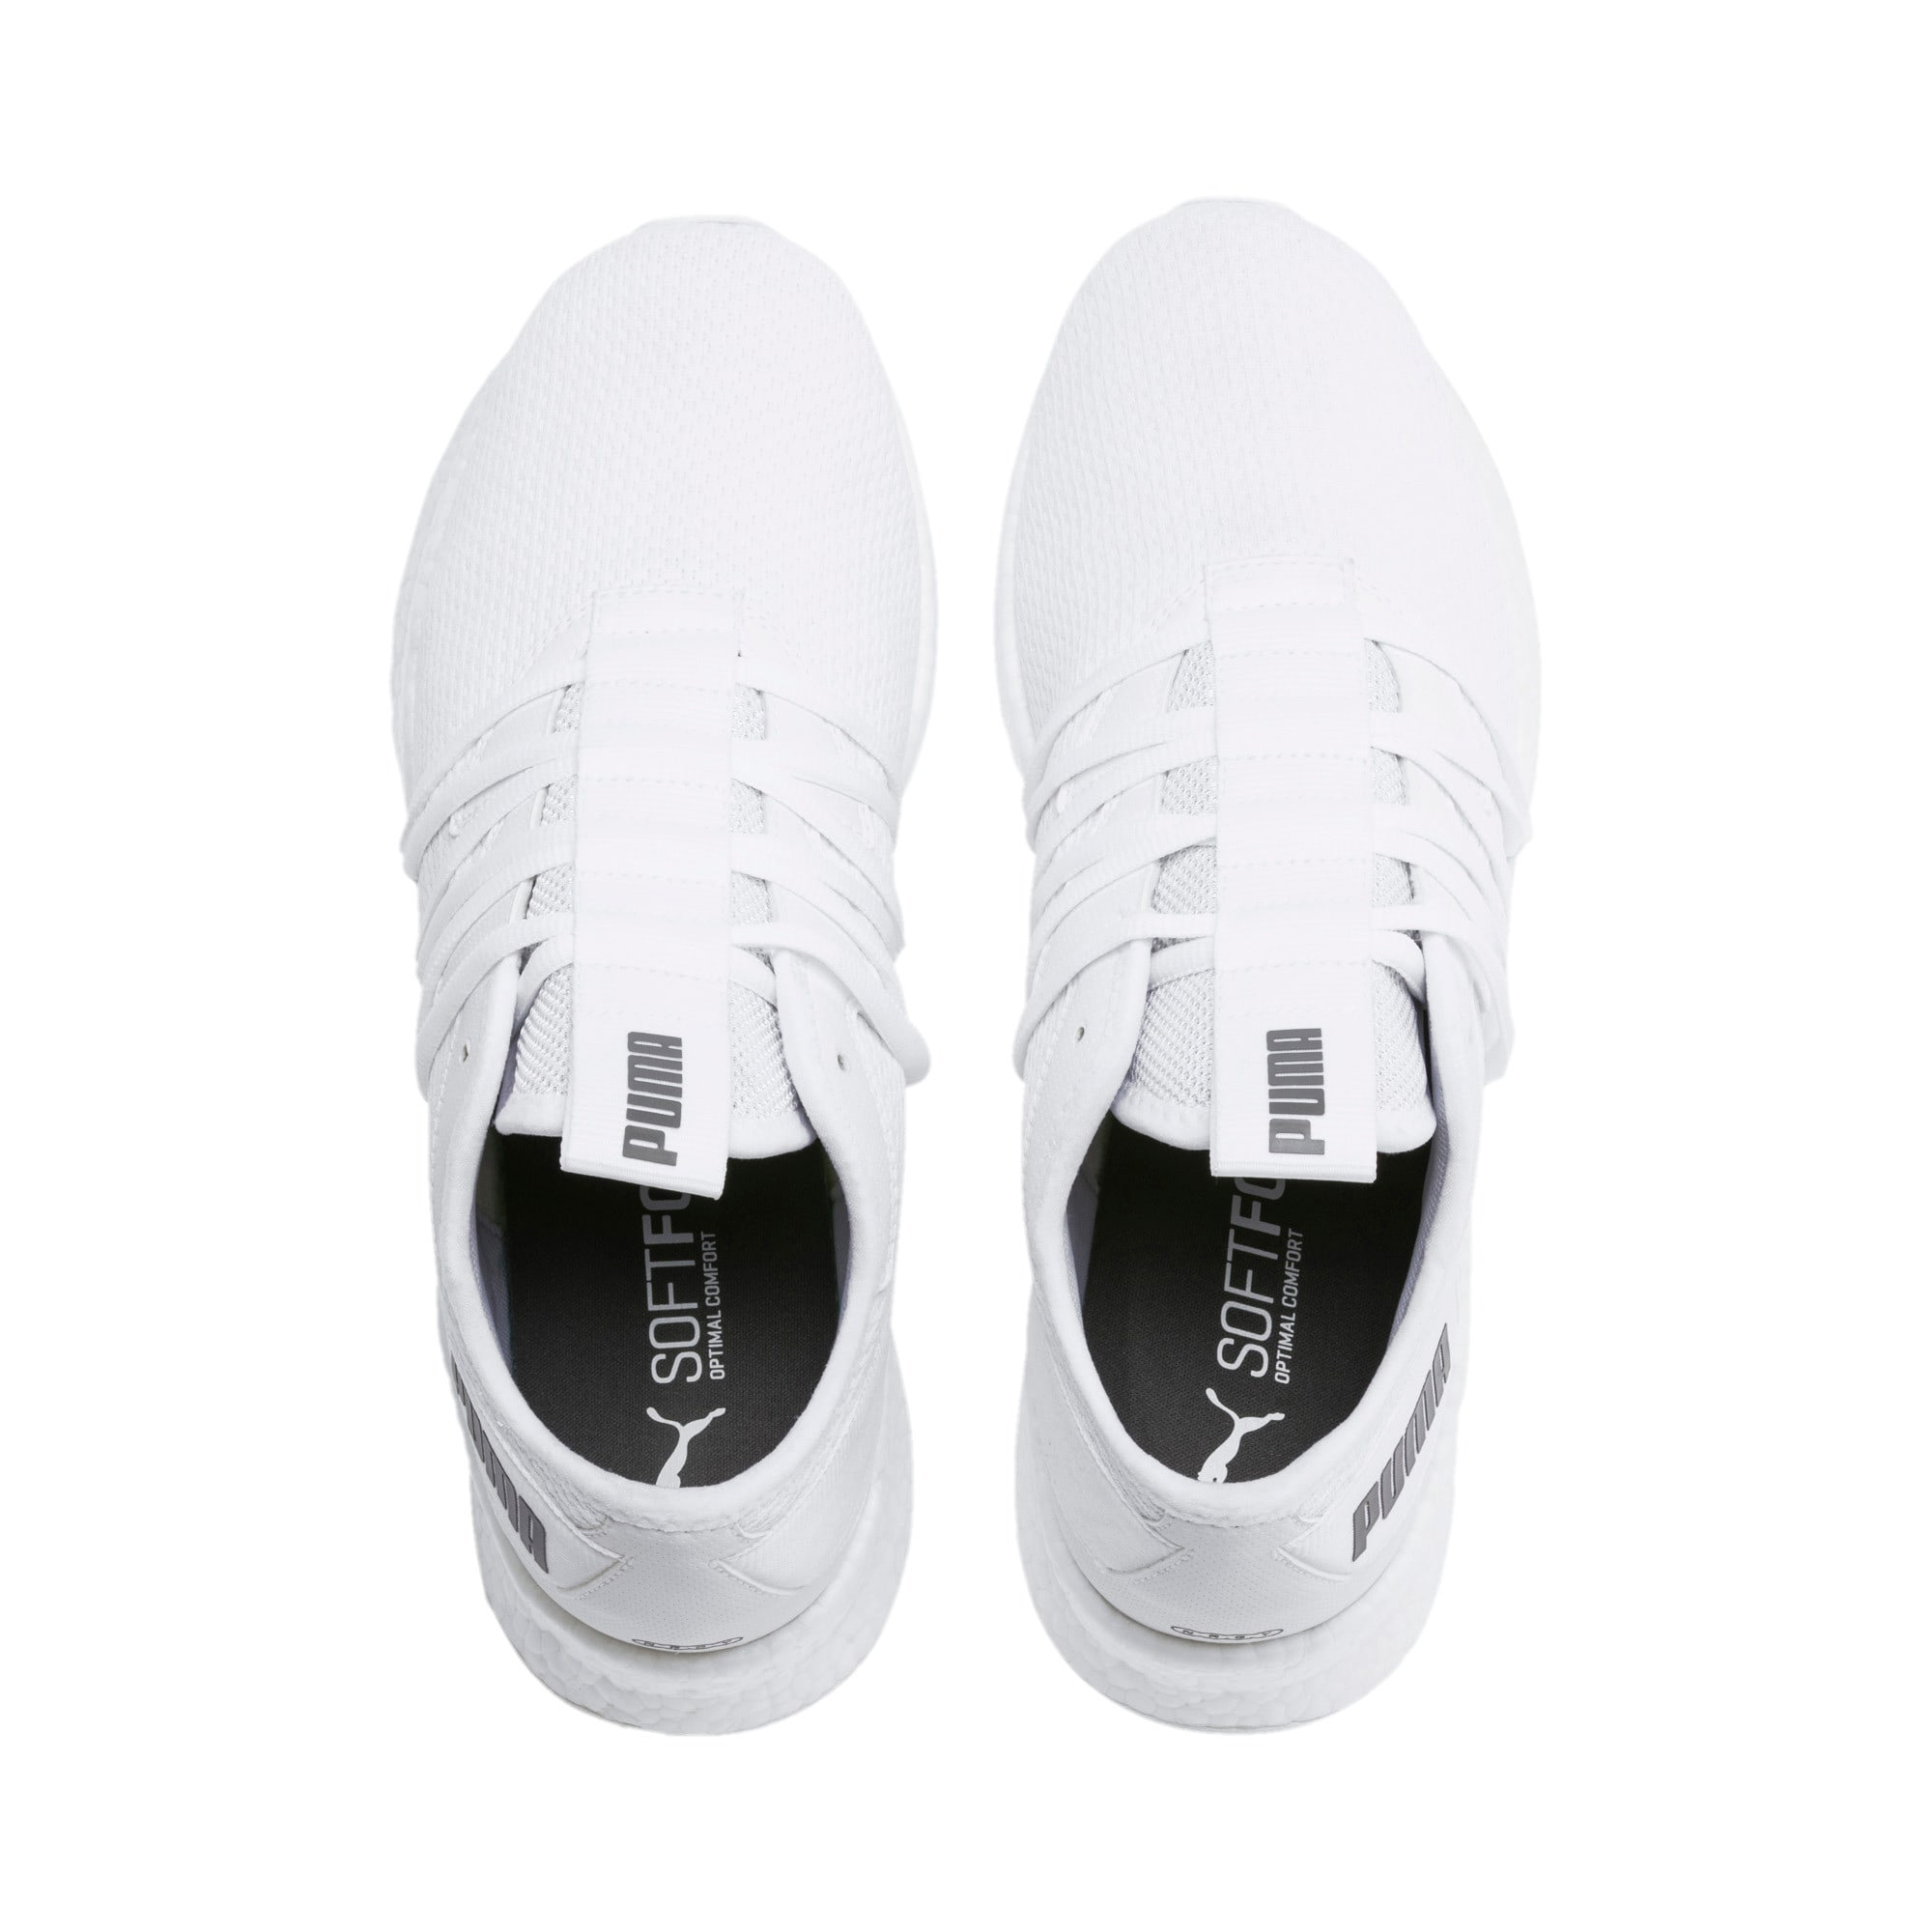 Thumbnail 7 of NRGY Star Running Shoes, Puma White-CASTLEROCK, medium